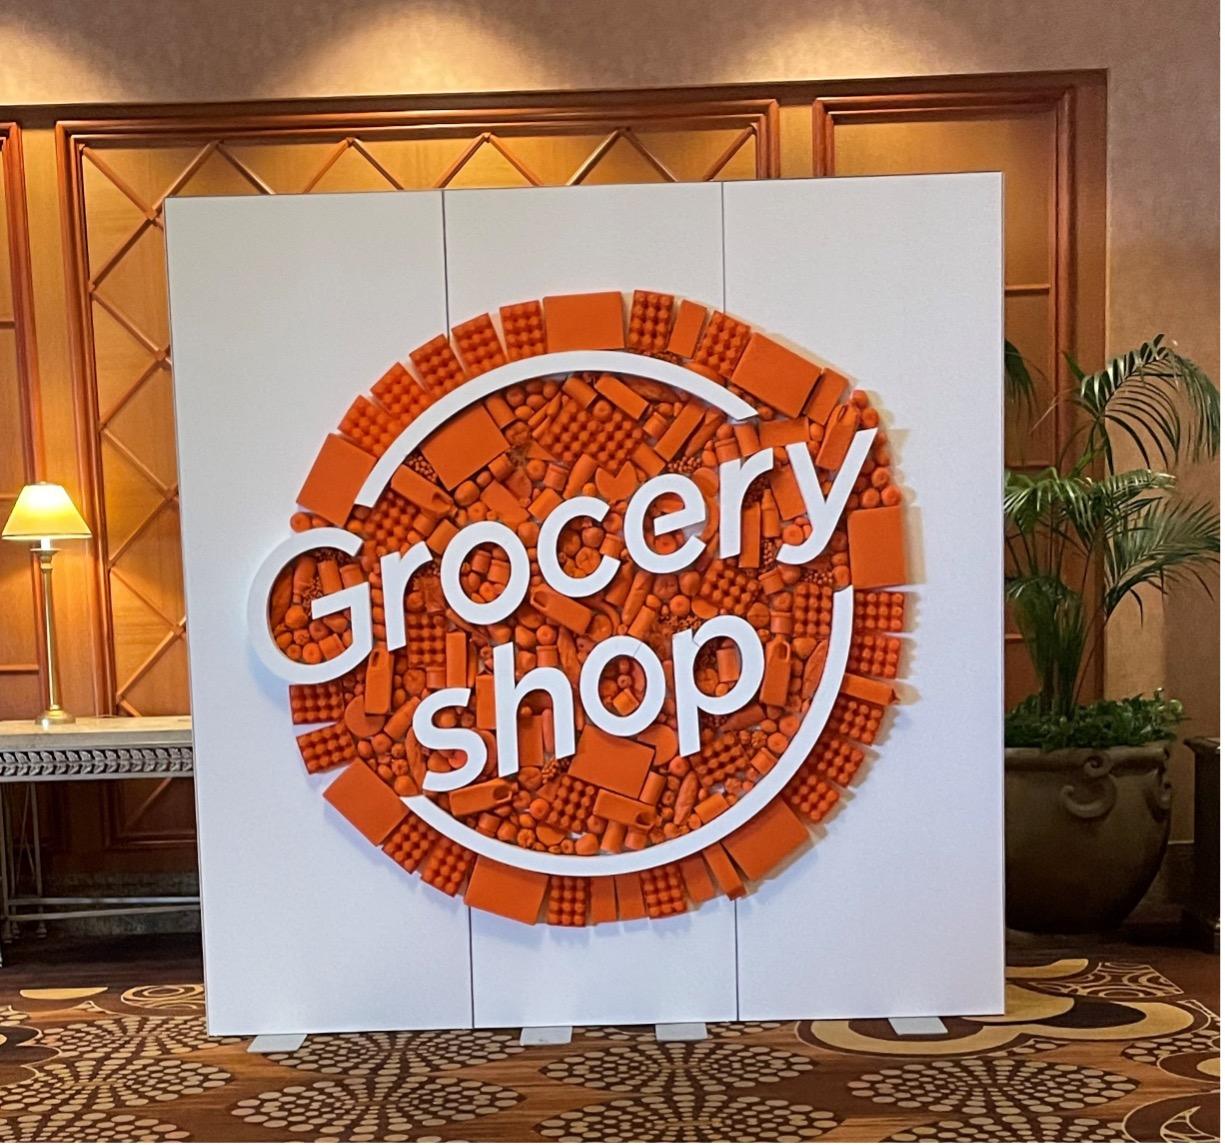 Groceryshop 2021: Three takeaways from Day 1